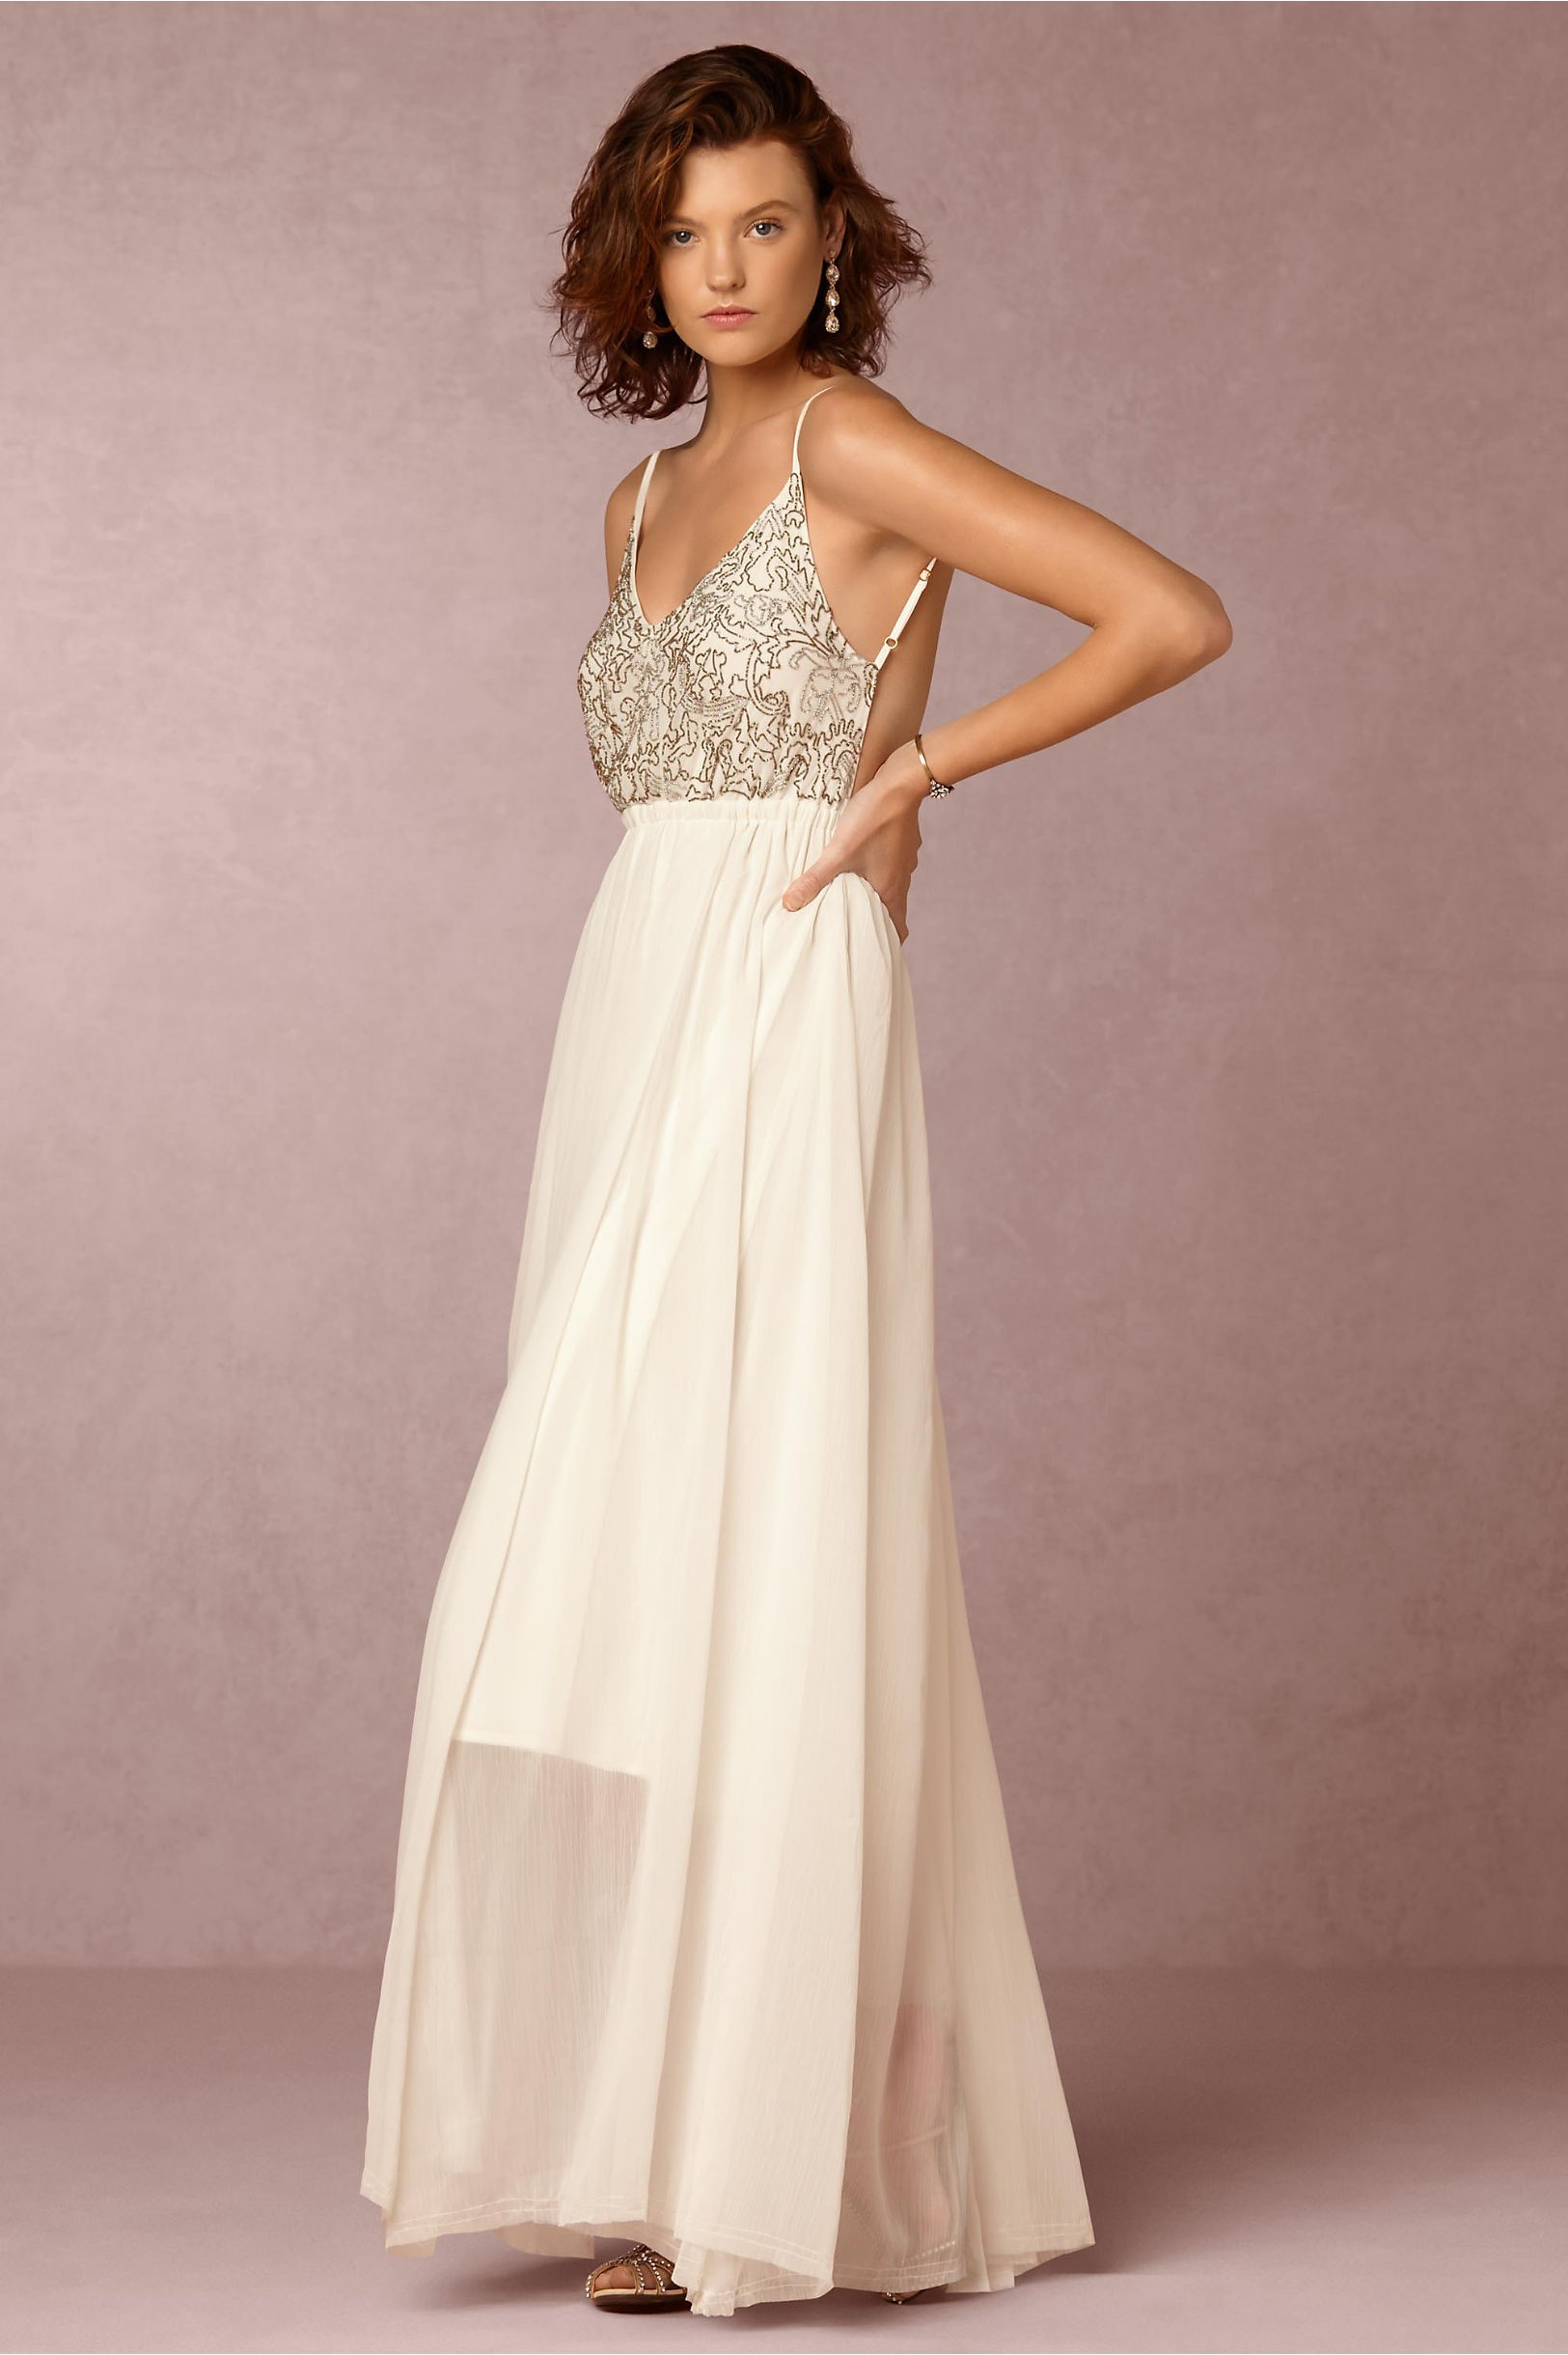 Falda semi-transparente para un traje de novia muy sofisticado